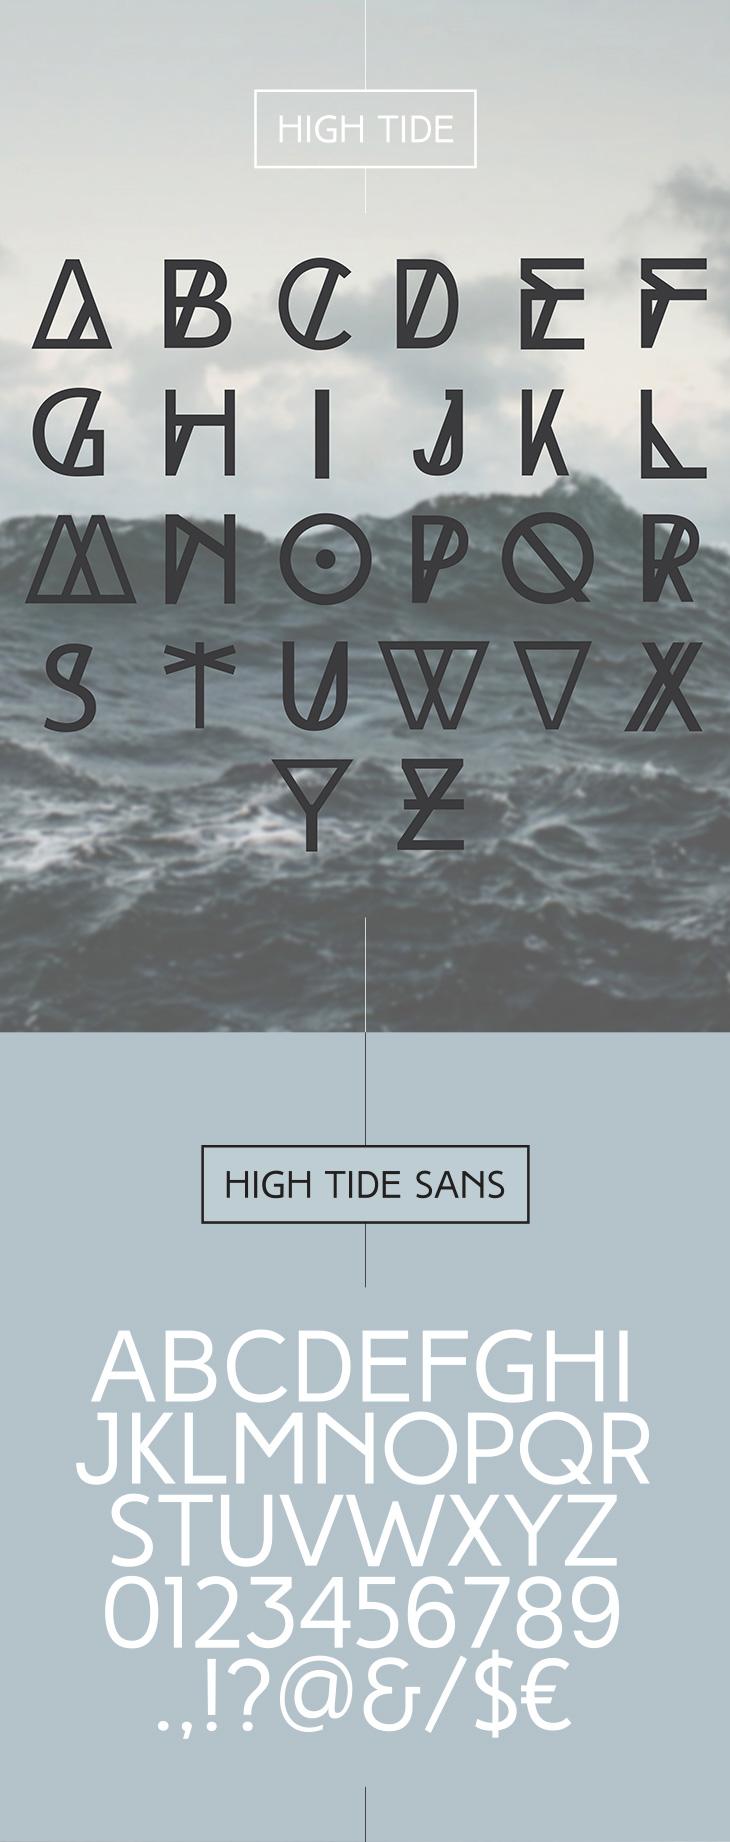 56. high tide